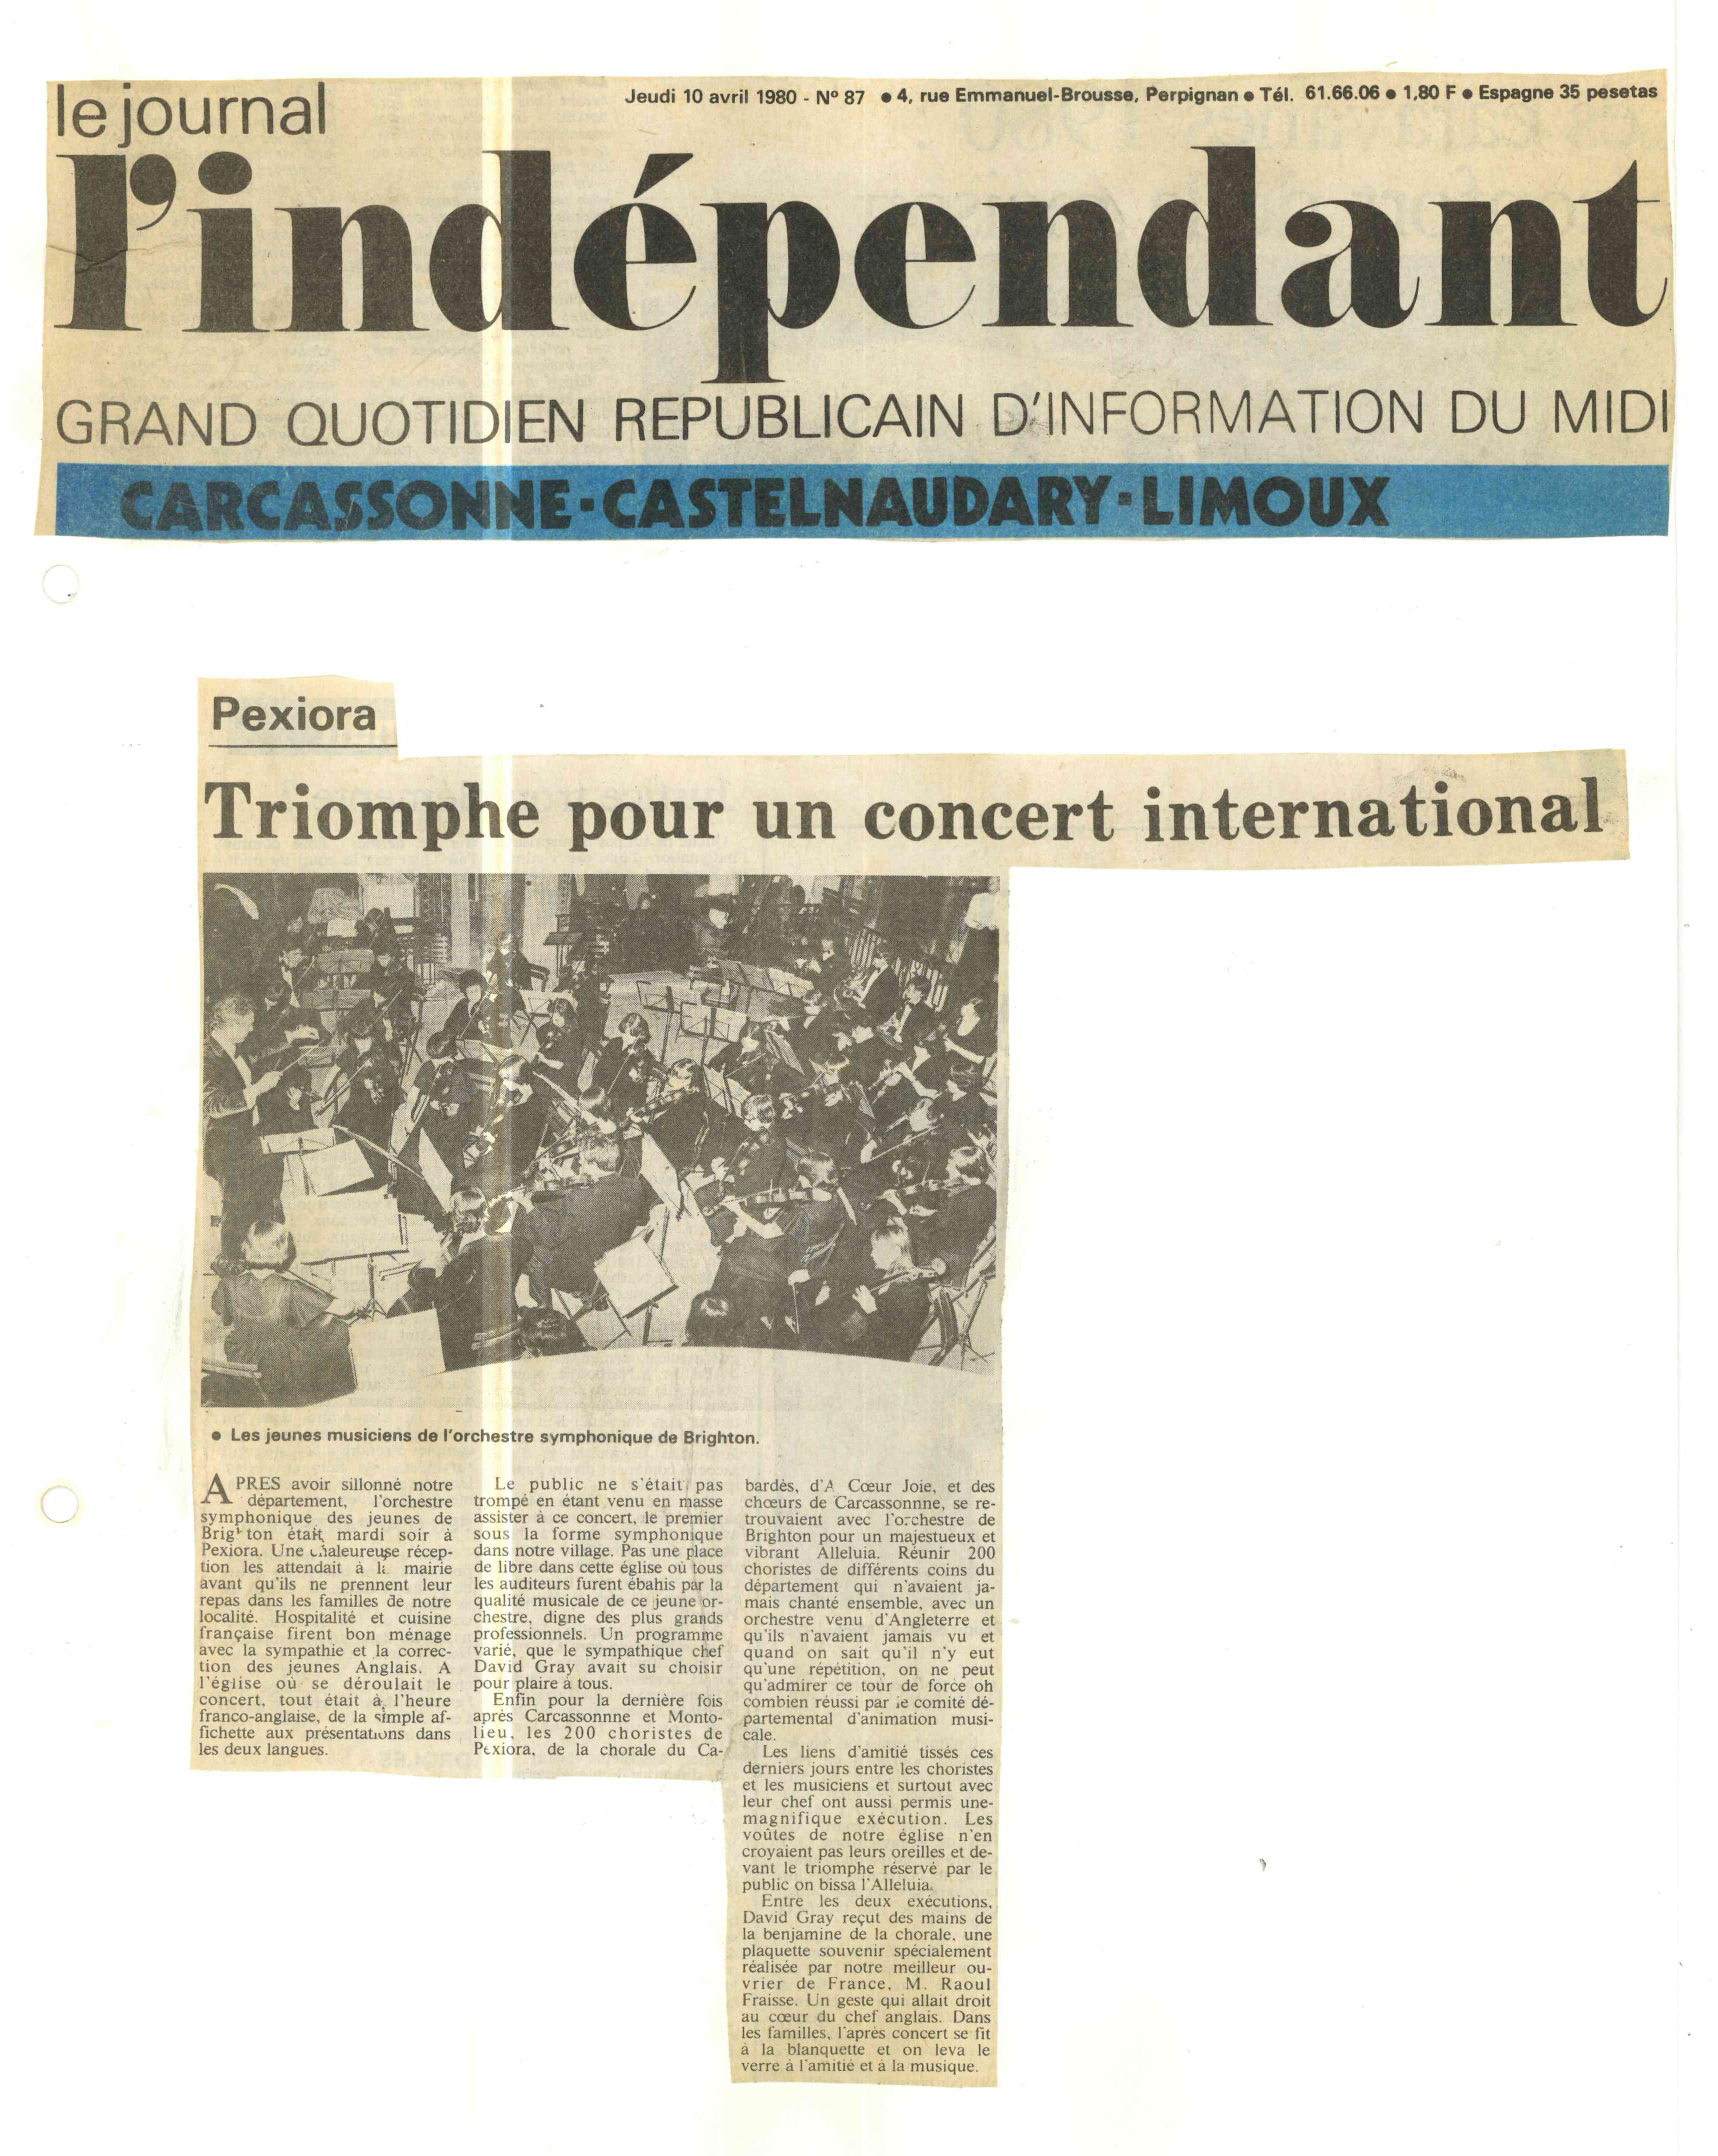 00198-L'independant, 10th April, 1980.jpg